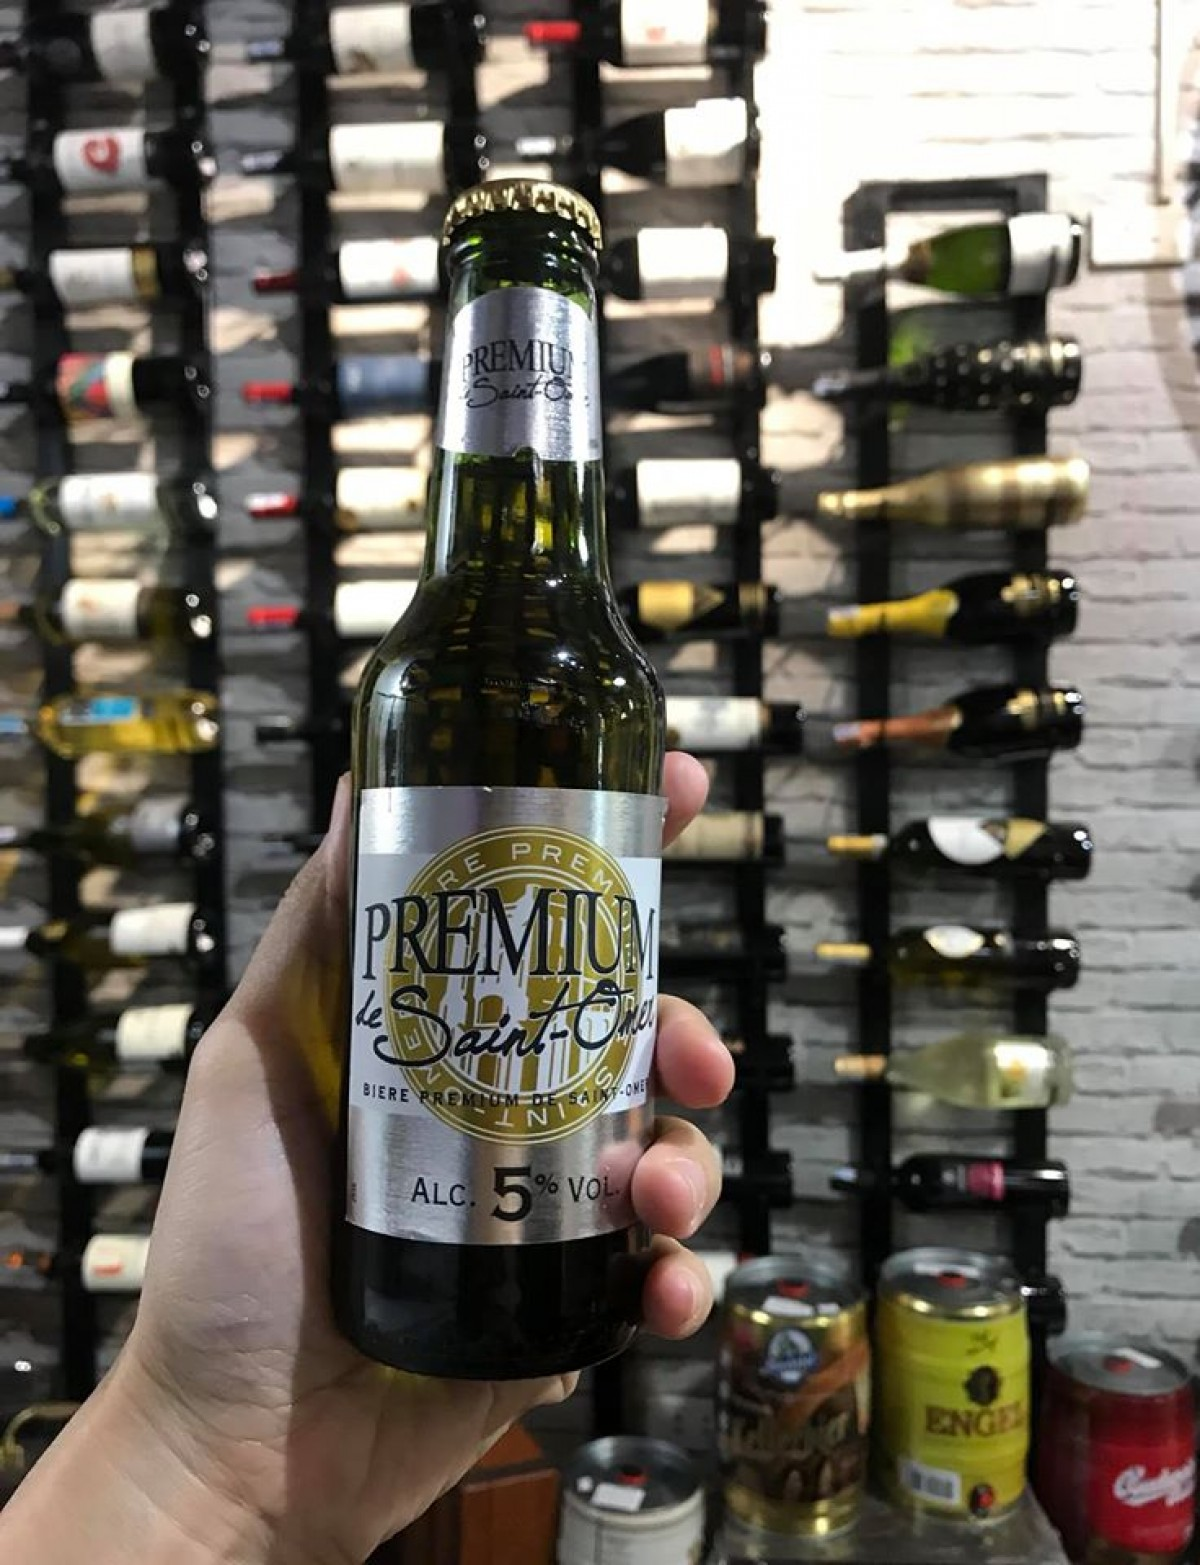 Bia Saint Omer 5% - chai 250 ml